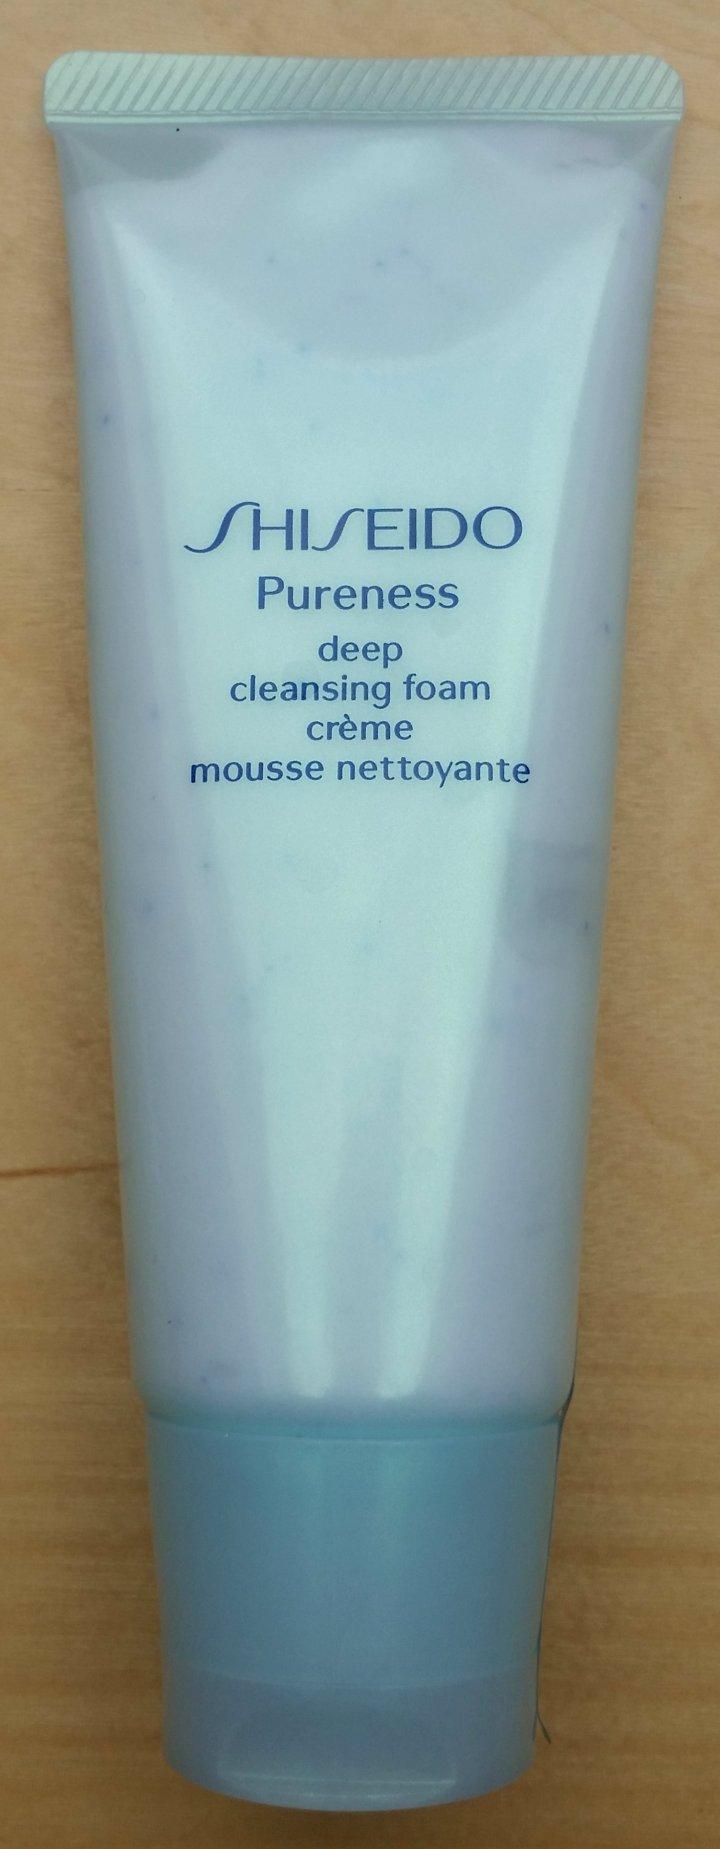 Review: Shiseido Pureness Deep CleansingFoam